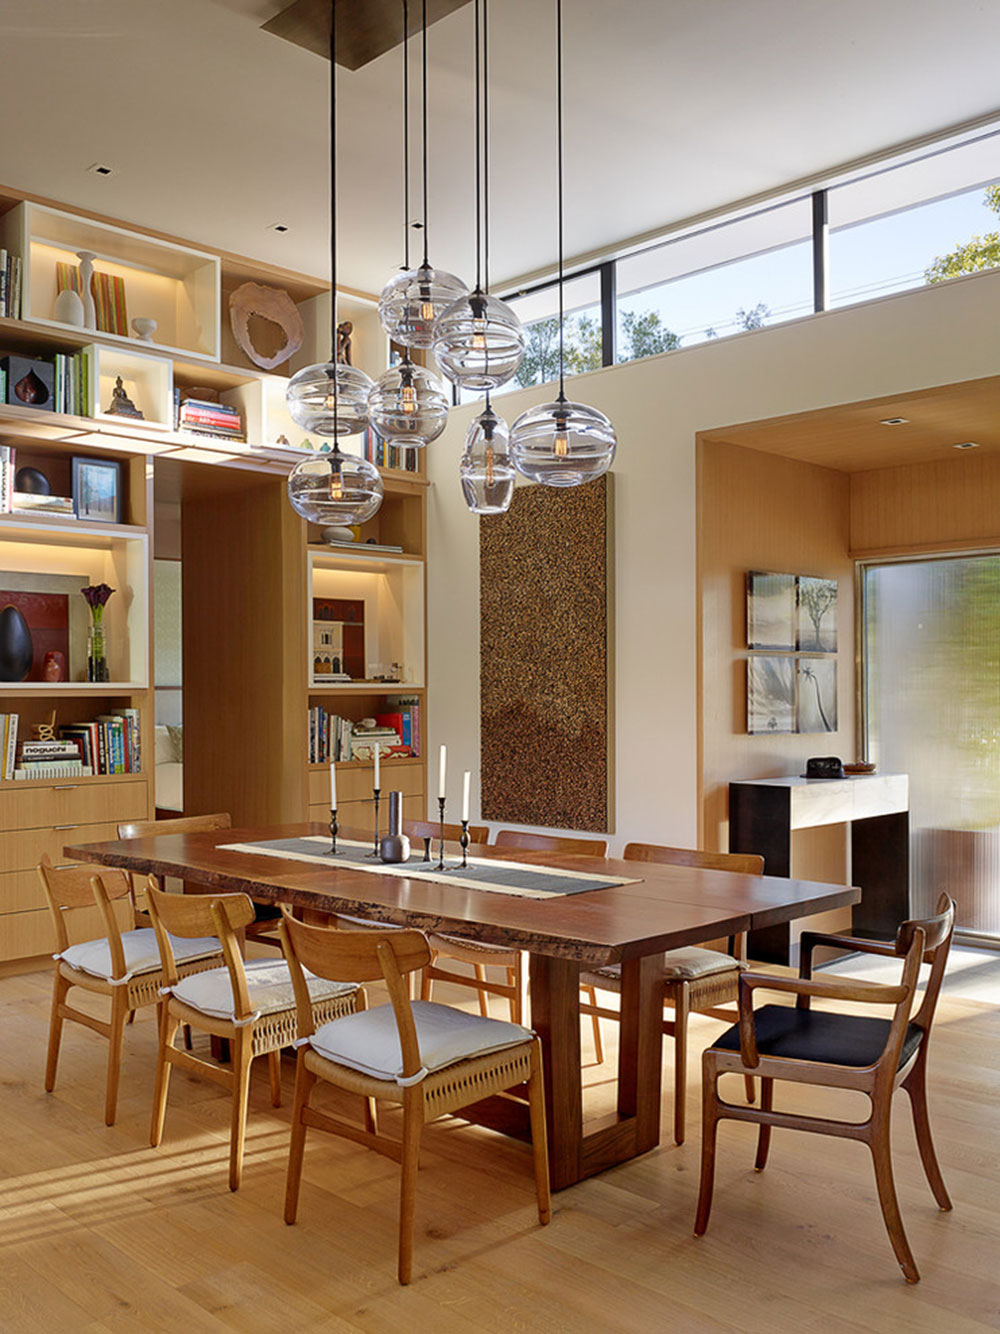 Interior-lighting-design-for-houses-2 Interior-lighting-design for houses